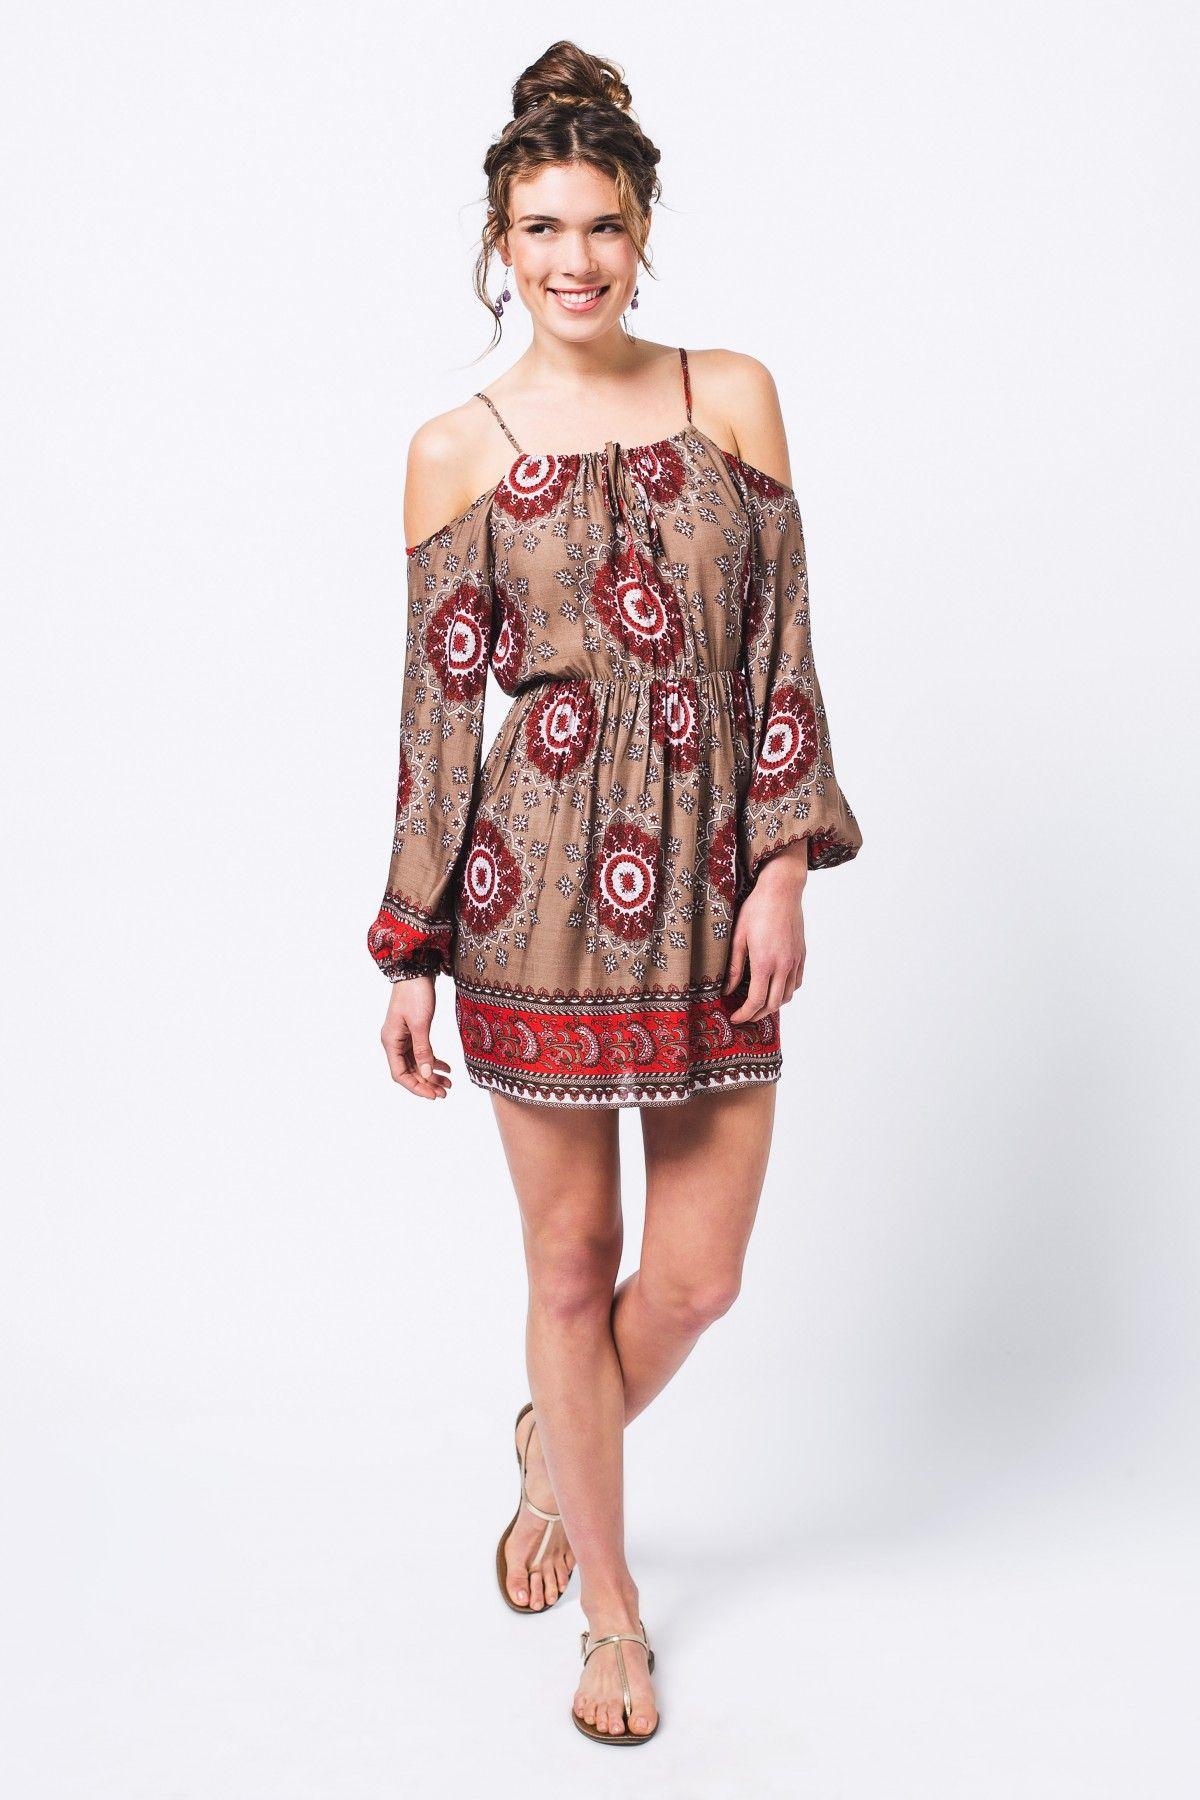 be2d572eac89 Beige Mandala Dress - Women's - Earthbound Trading Co. | Dresses ...